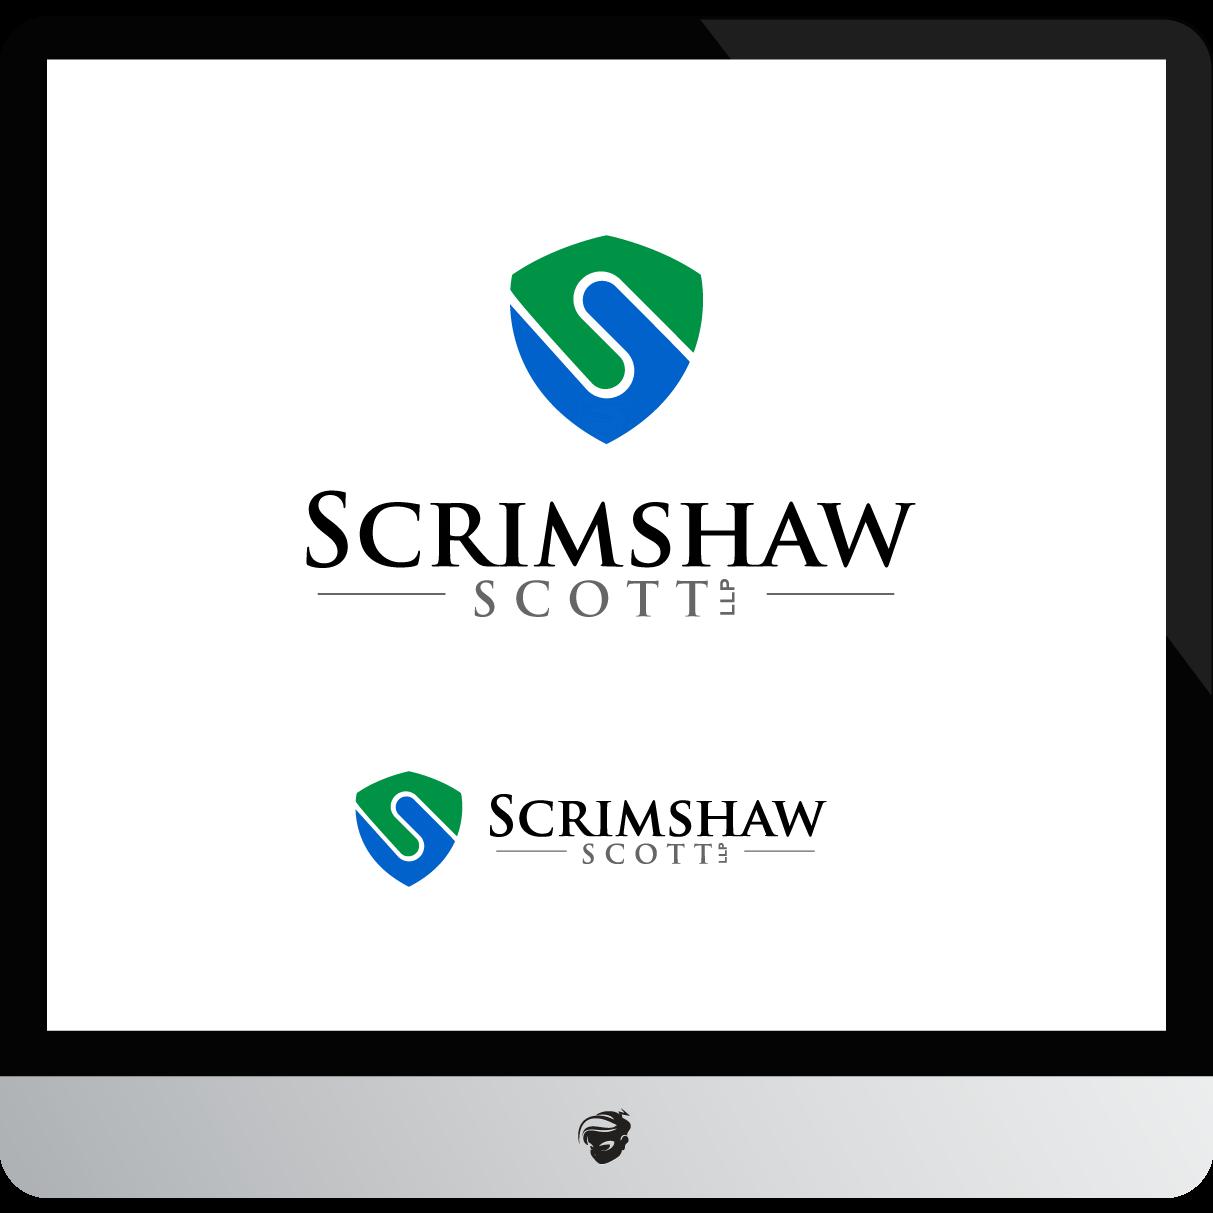 Logo Design by zesthar - Entry No. 73 in the Logo Design Contest Creative Logo Design for Scrimshaw Scott LLP.